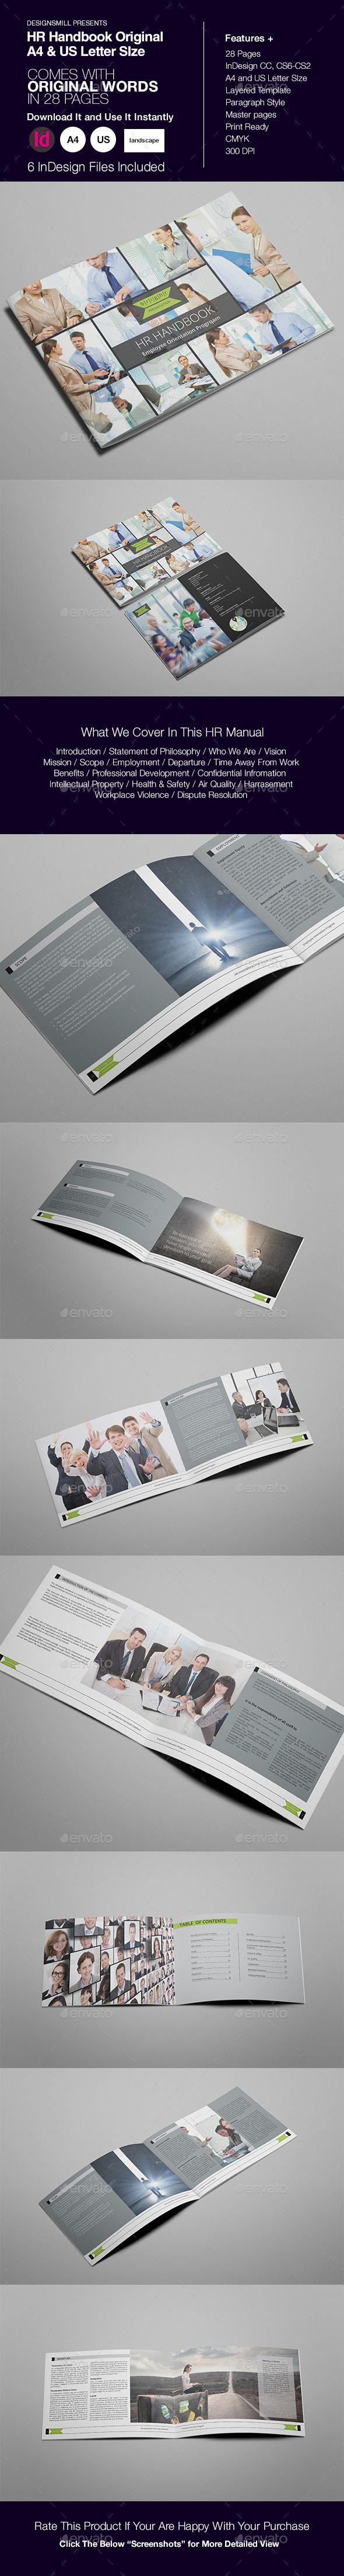 HR Handbook or Manual   Pinterest   Employee handbook, Print ...